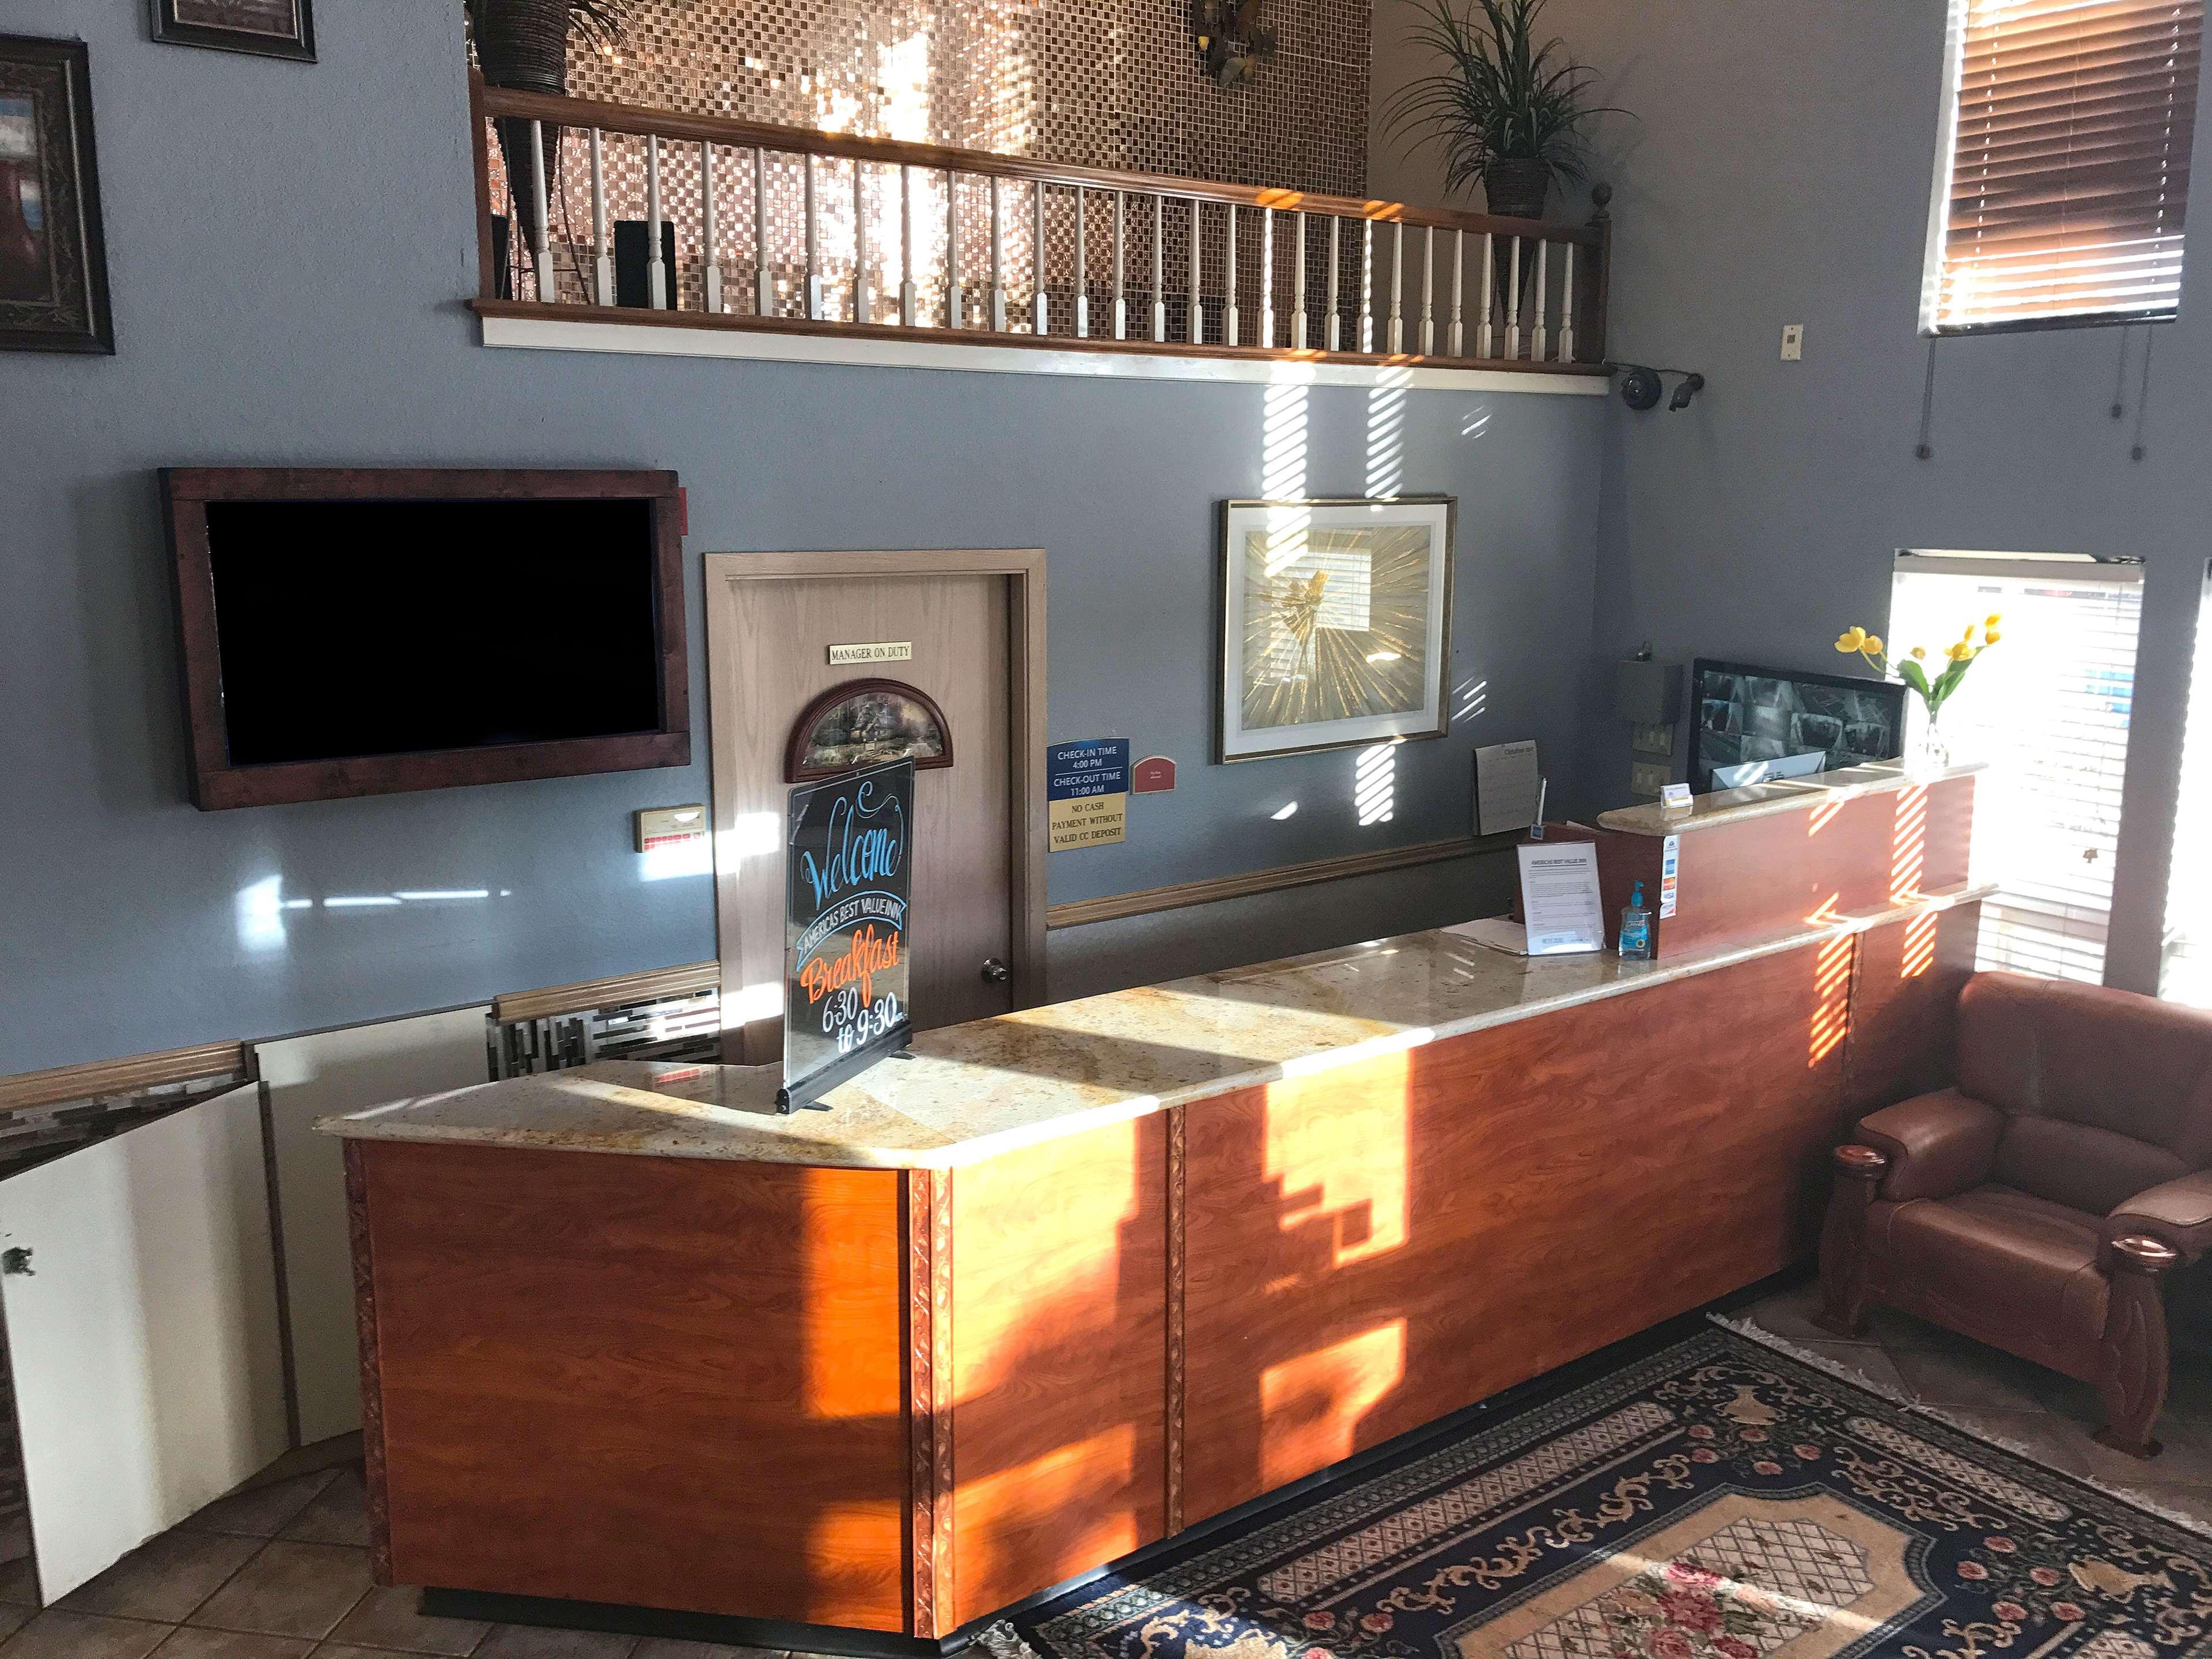 americas best value inn lynnwood seattle at 4117